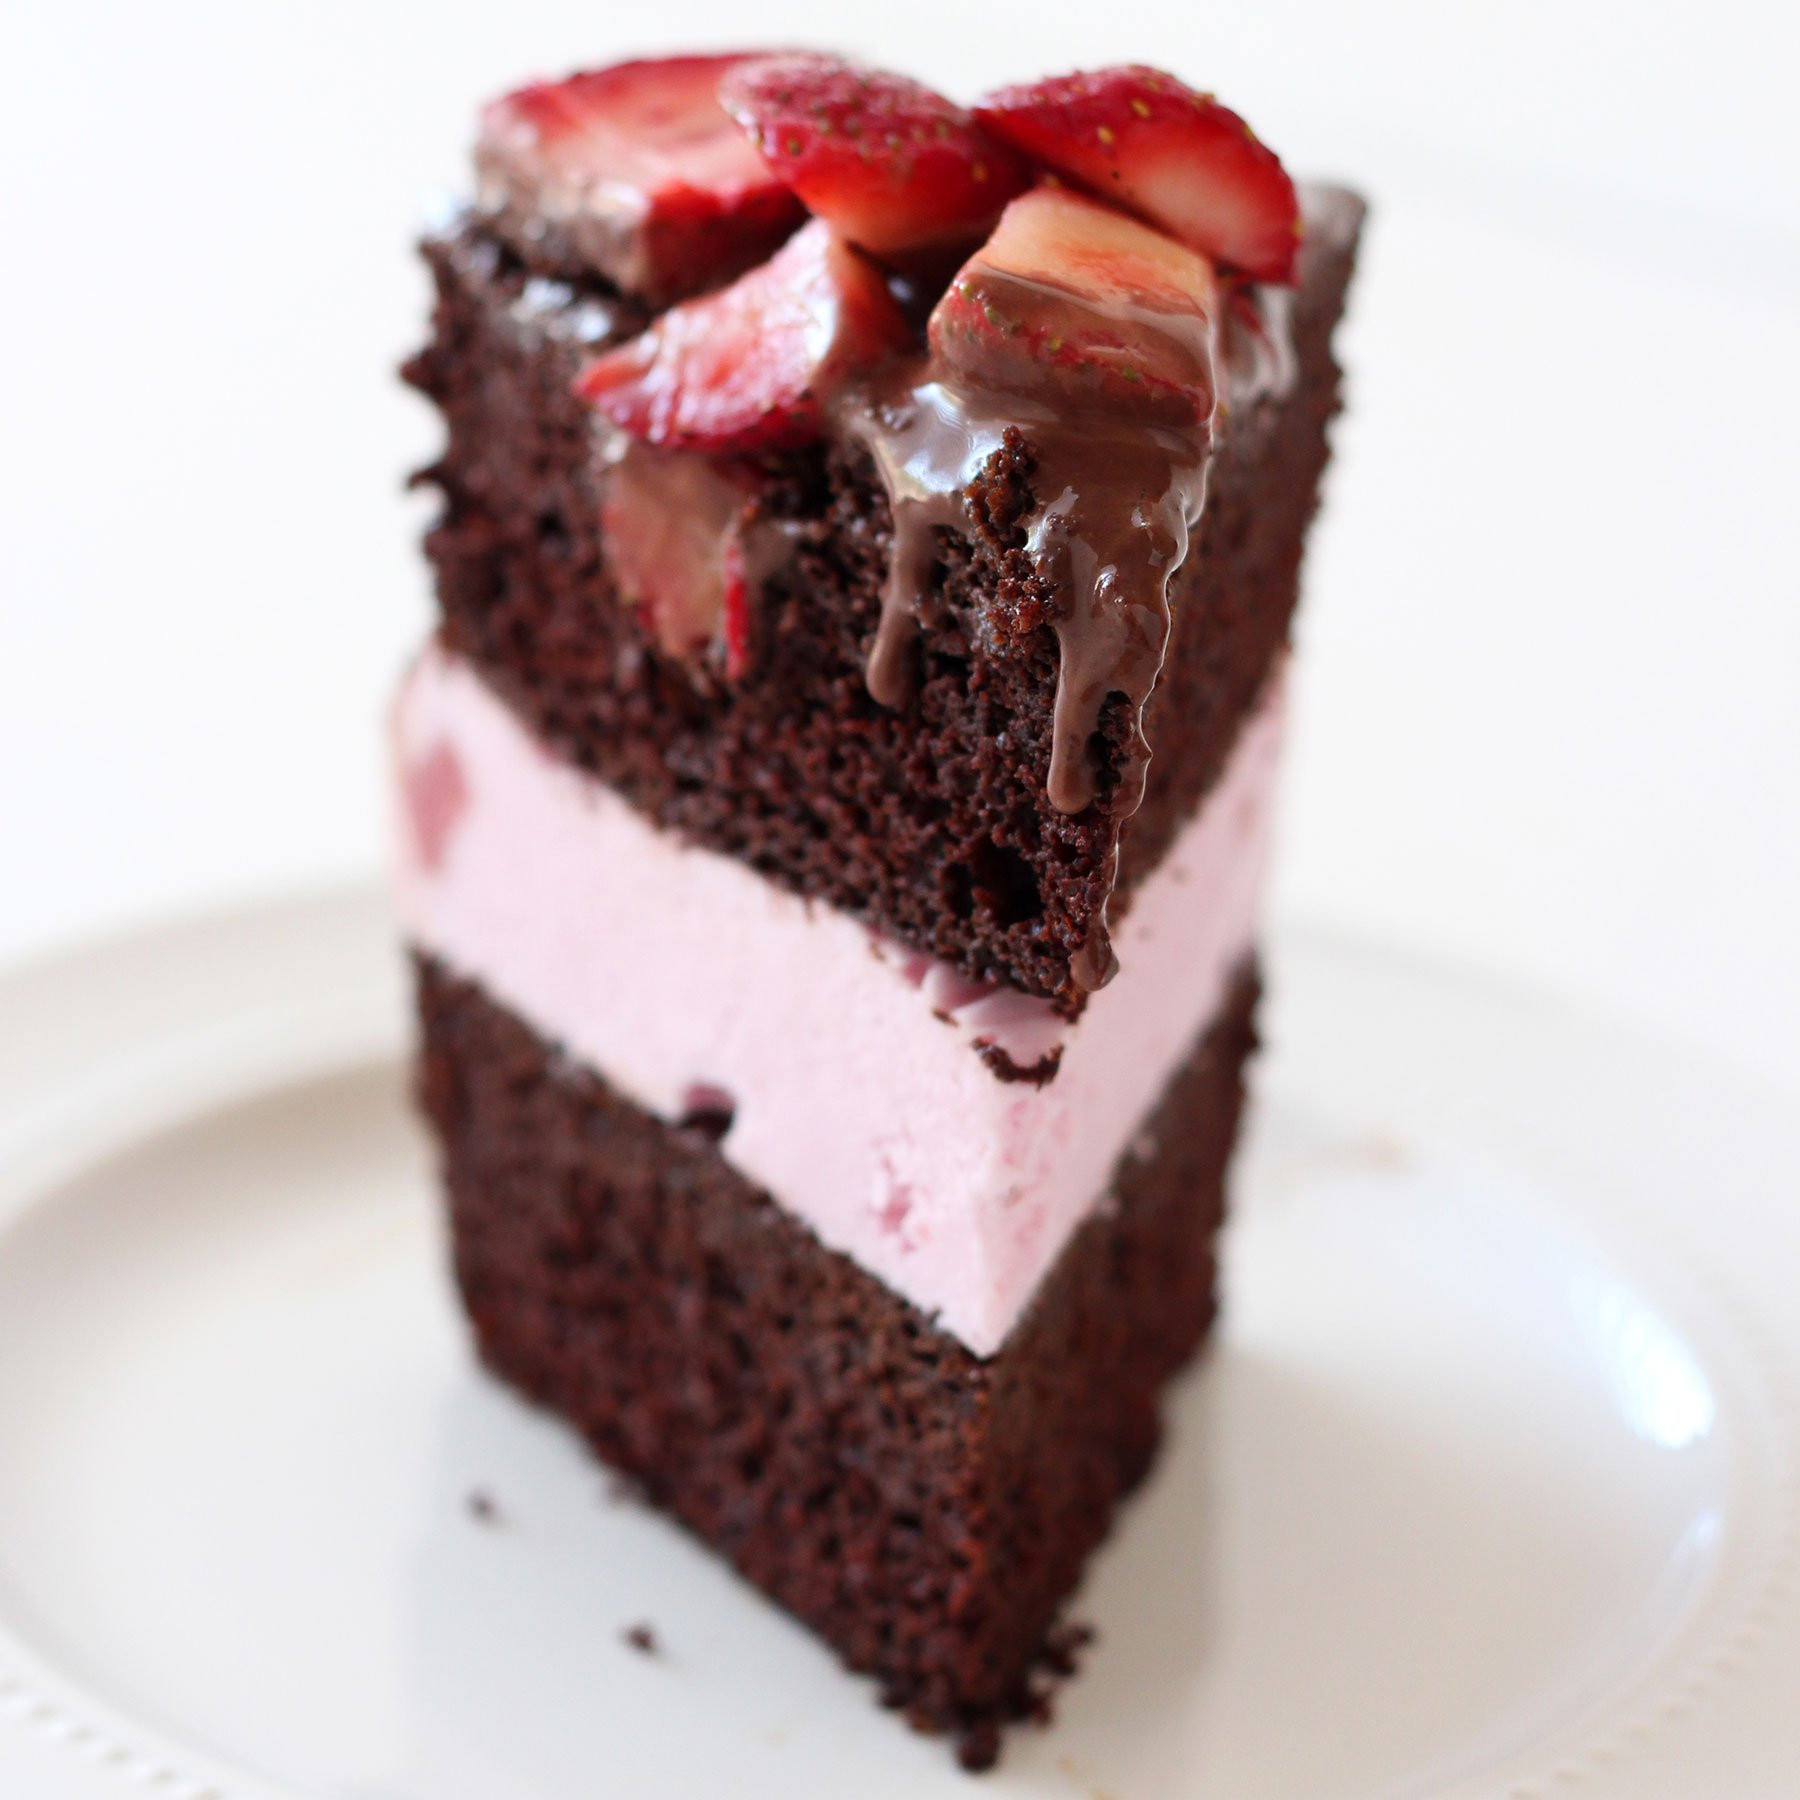 Chocolate Ice Cream Cake  Chocolate Covered Strawberry Ice Cream Cake